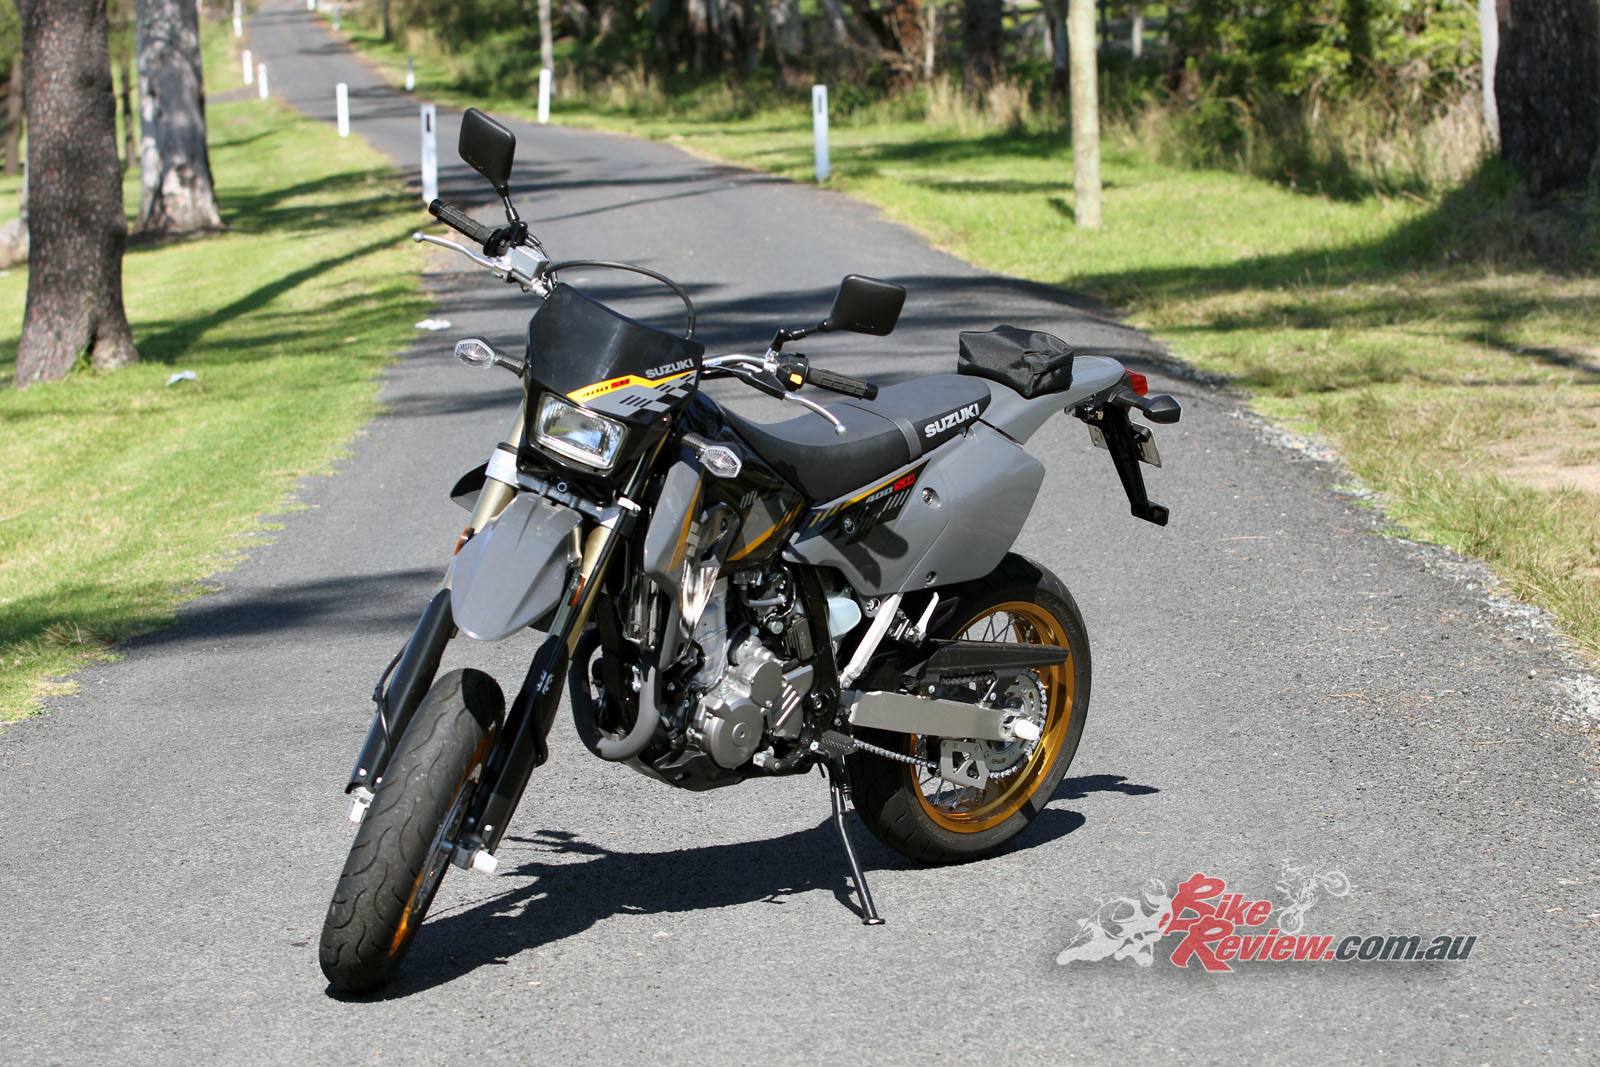 Review 2017 Suzuki Dr Z400sm Bike Review